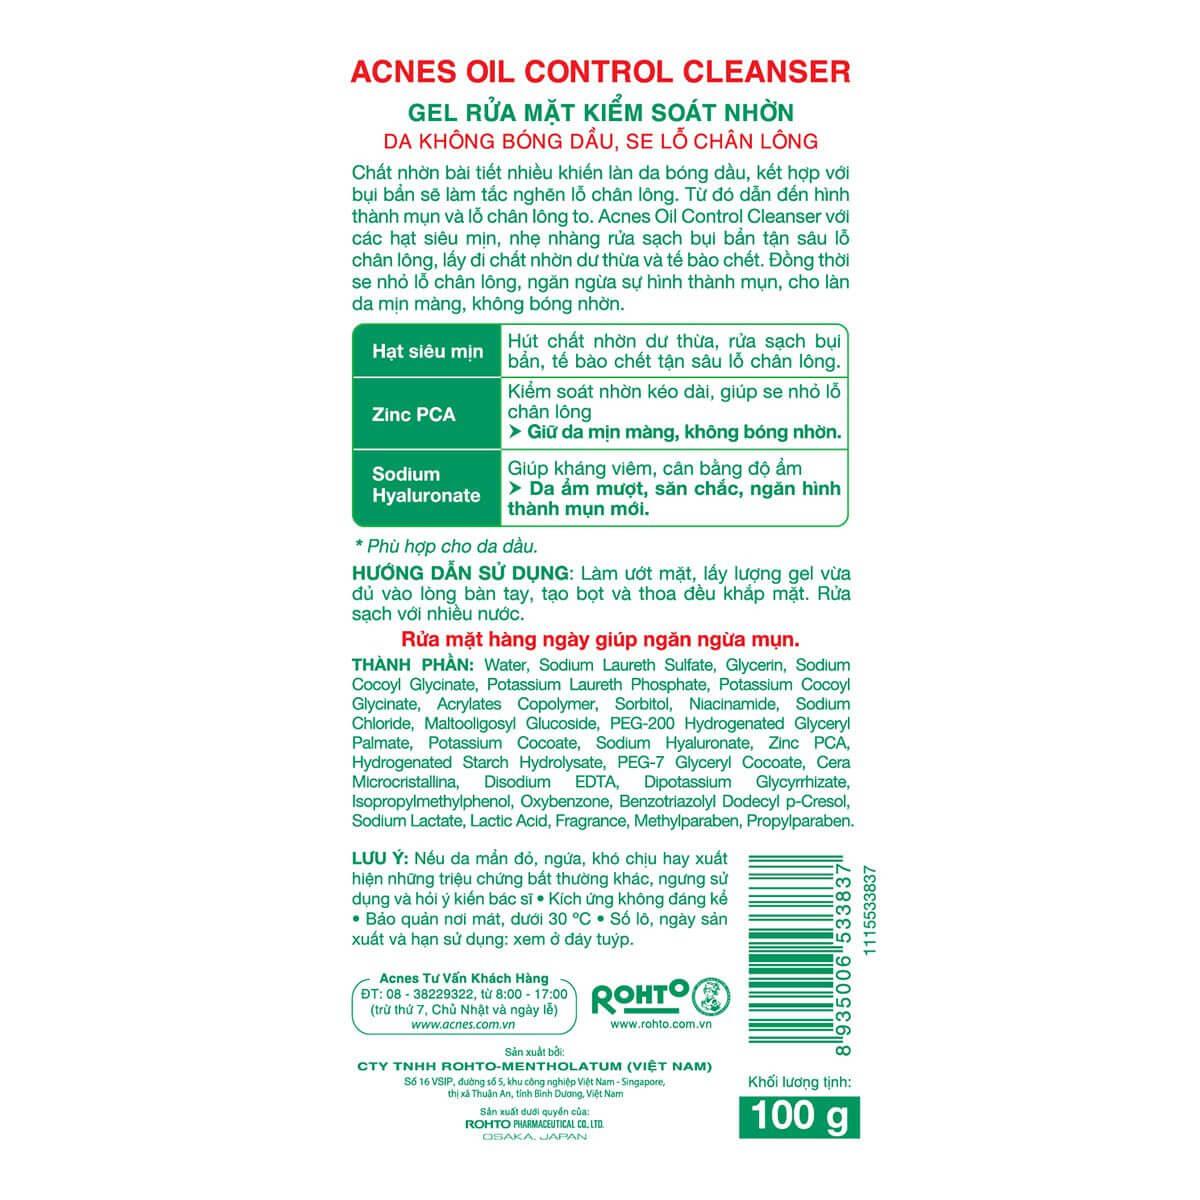 Acnes Oil Control Cleanser Gel rửa mặt kiểm soát nhờn